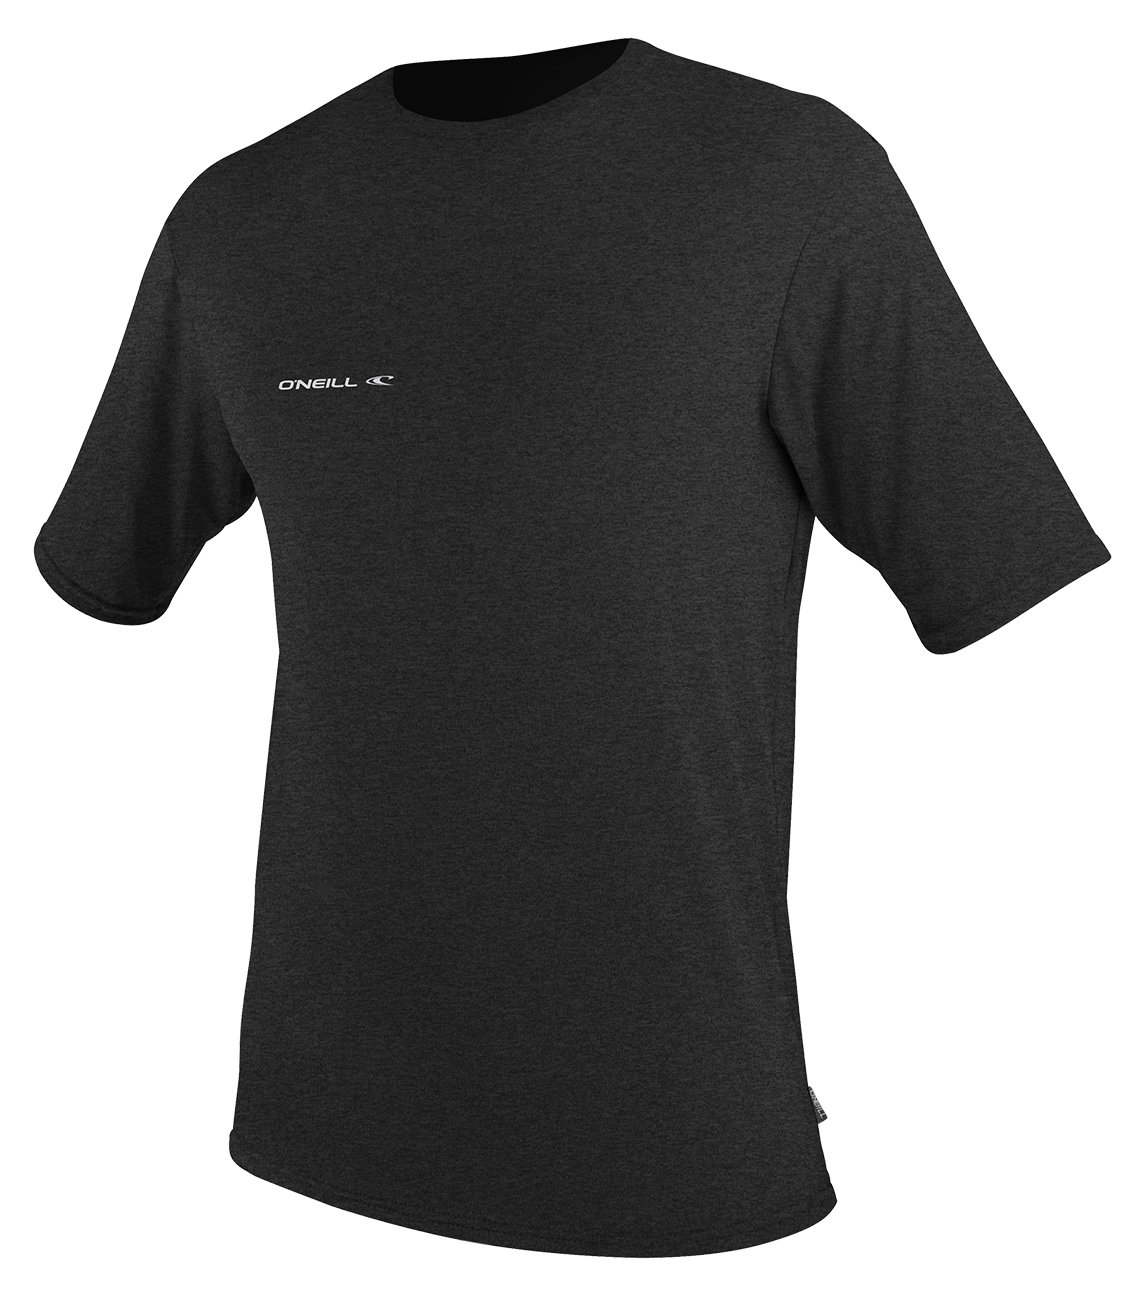 O'Neill  Men's Hybrid UPF 50+ Short Sleeve Sun Shirt, Black,X-Large by O'NEILL